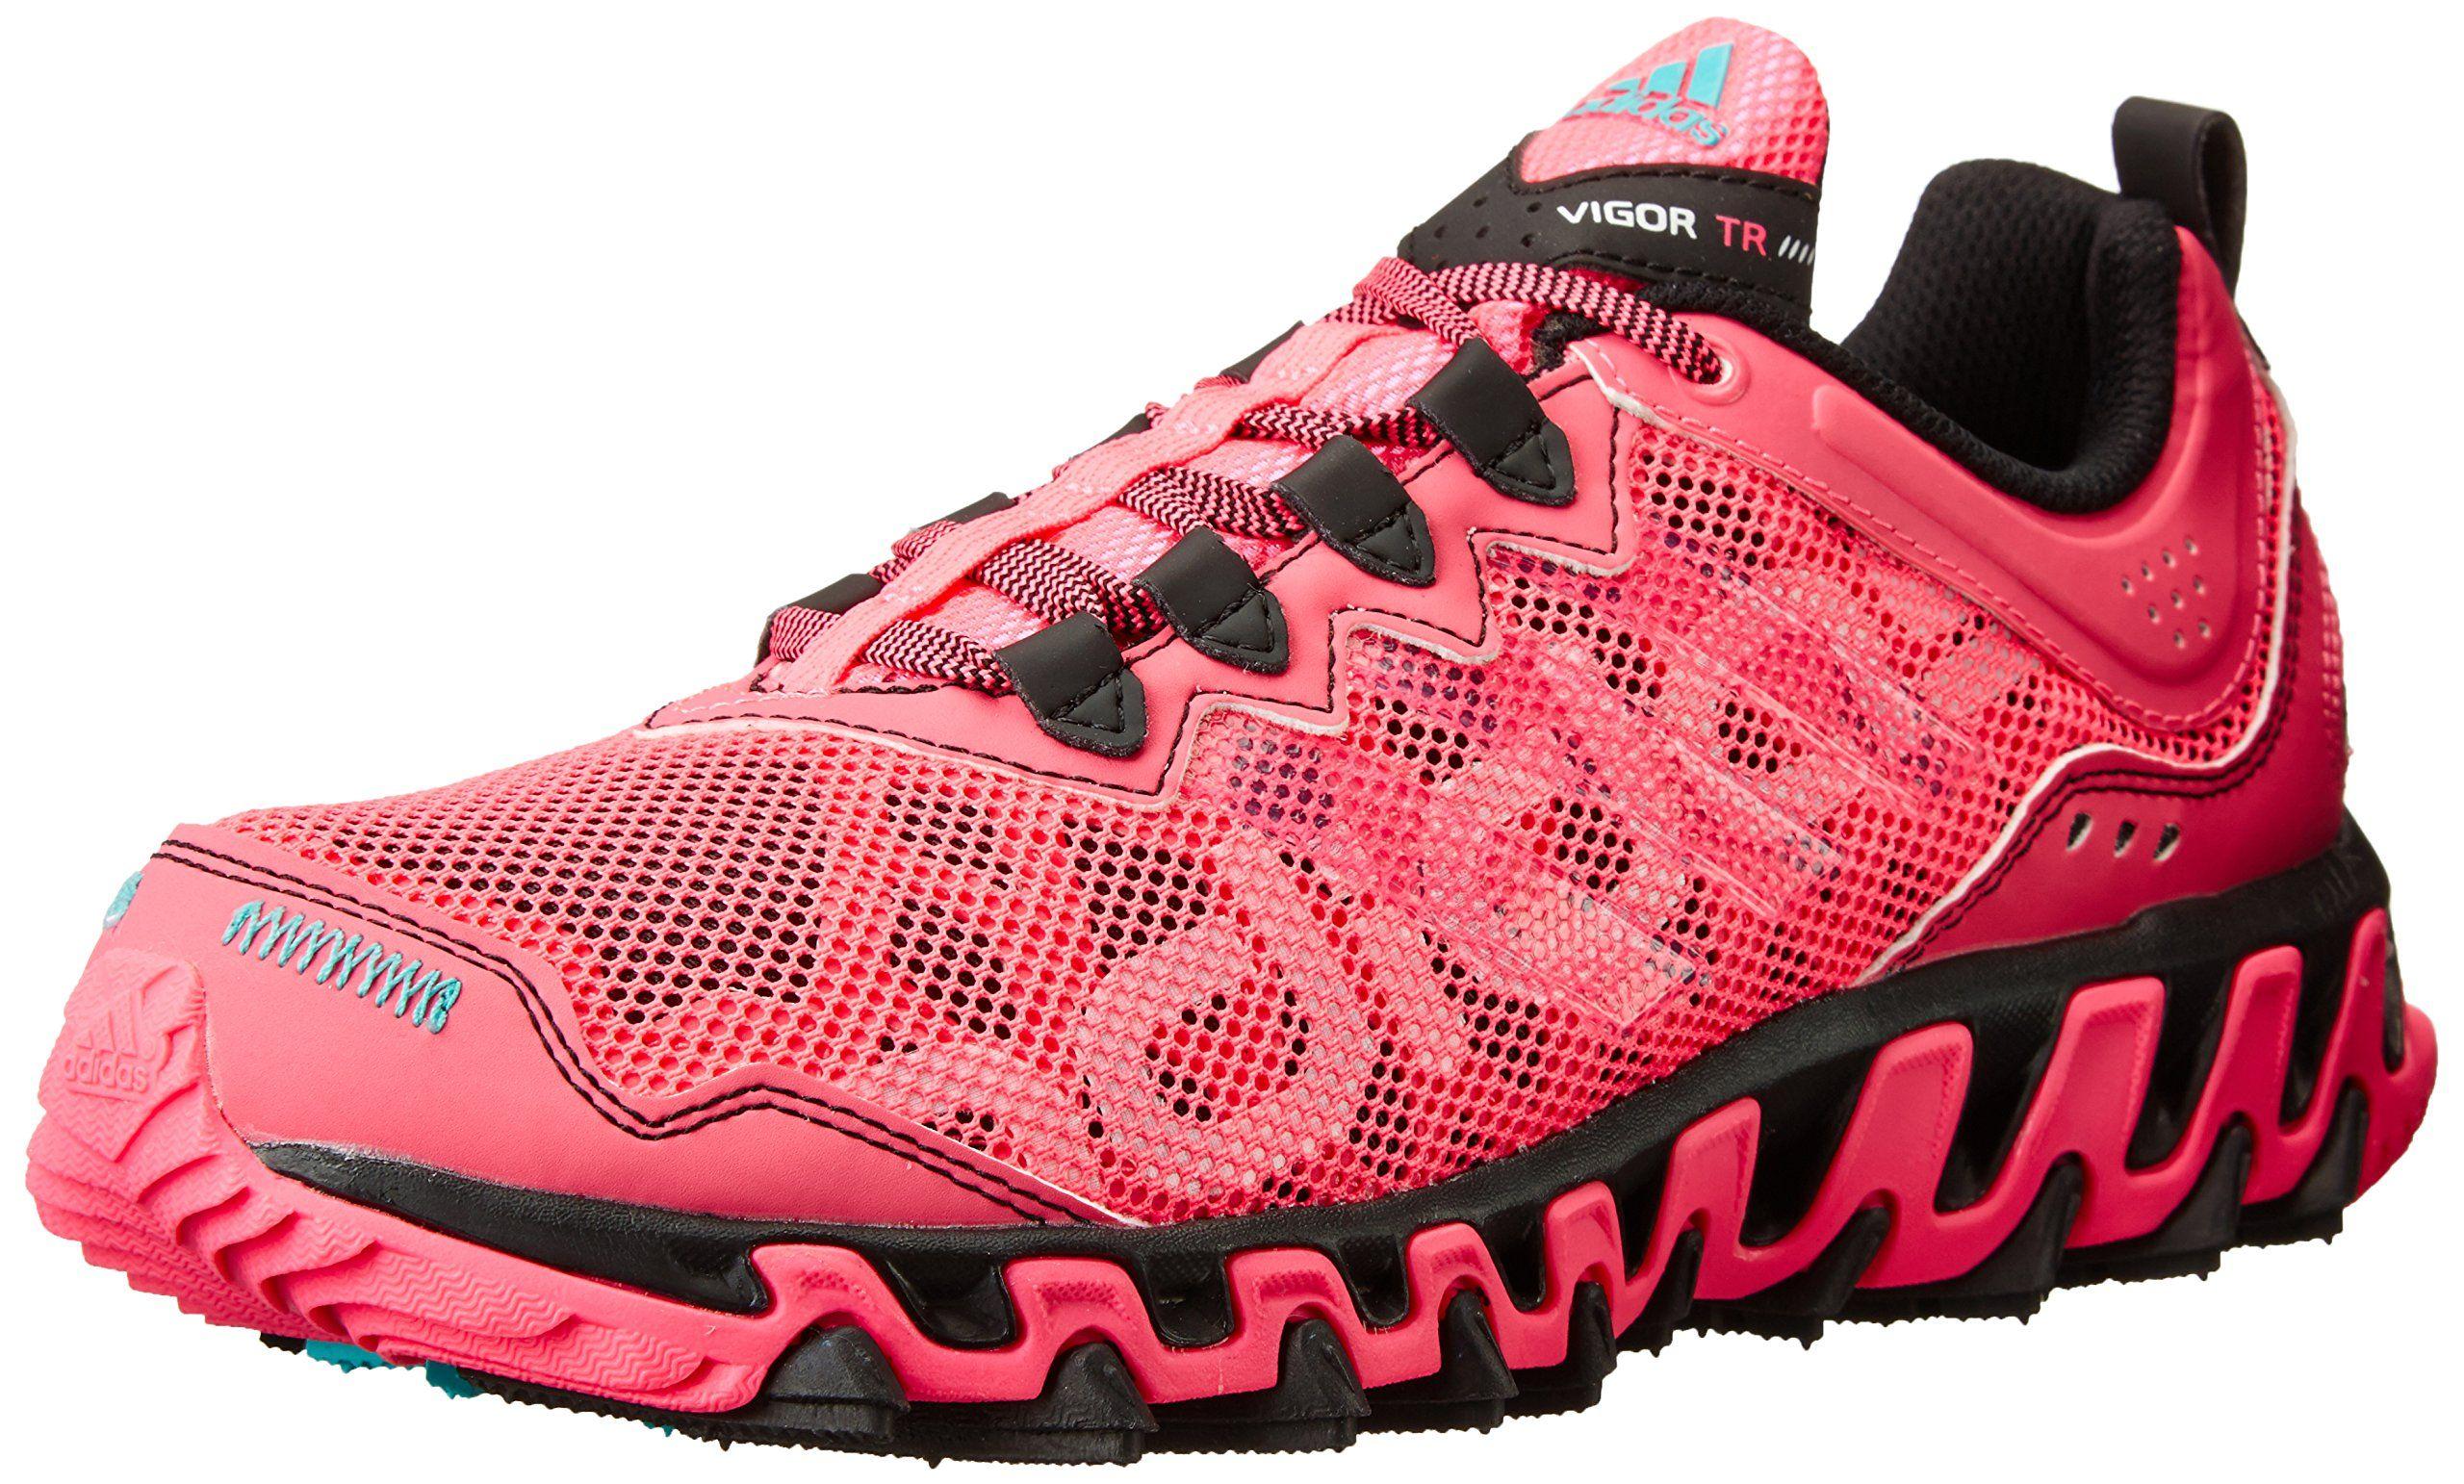 fcd79f75605fd Amazon.com: adidas Performance Women's Vigor 4 TR W Trail Running ...